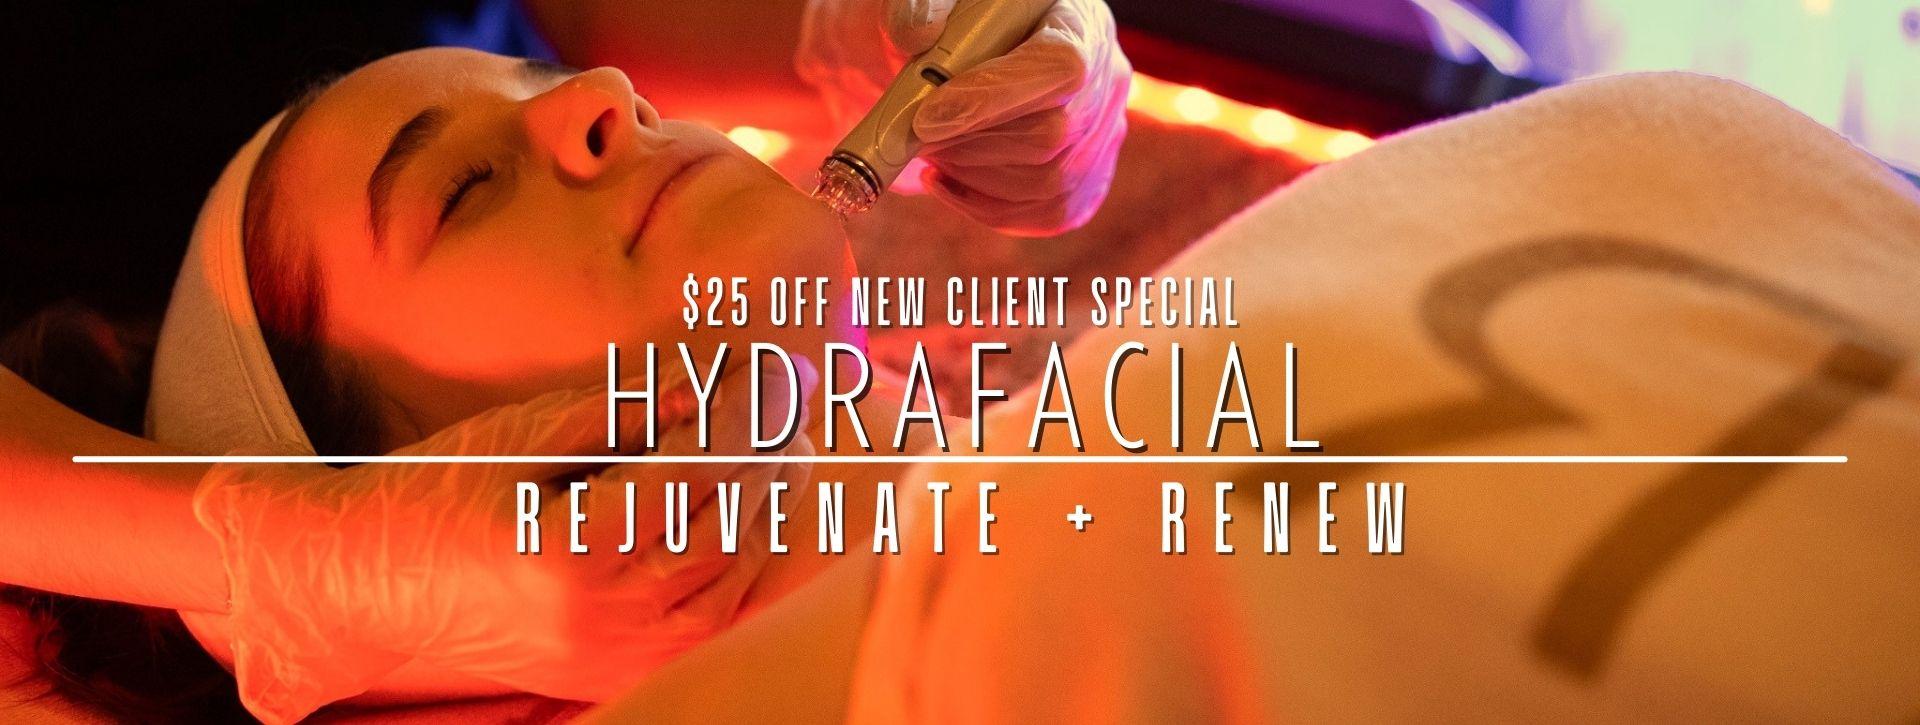 woman having a hydrafacial treatment promoting rejuvenate + renew